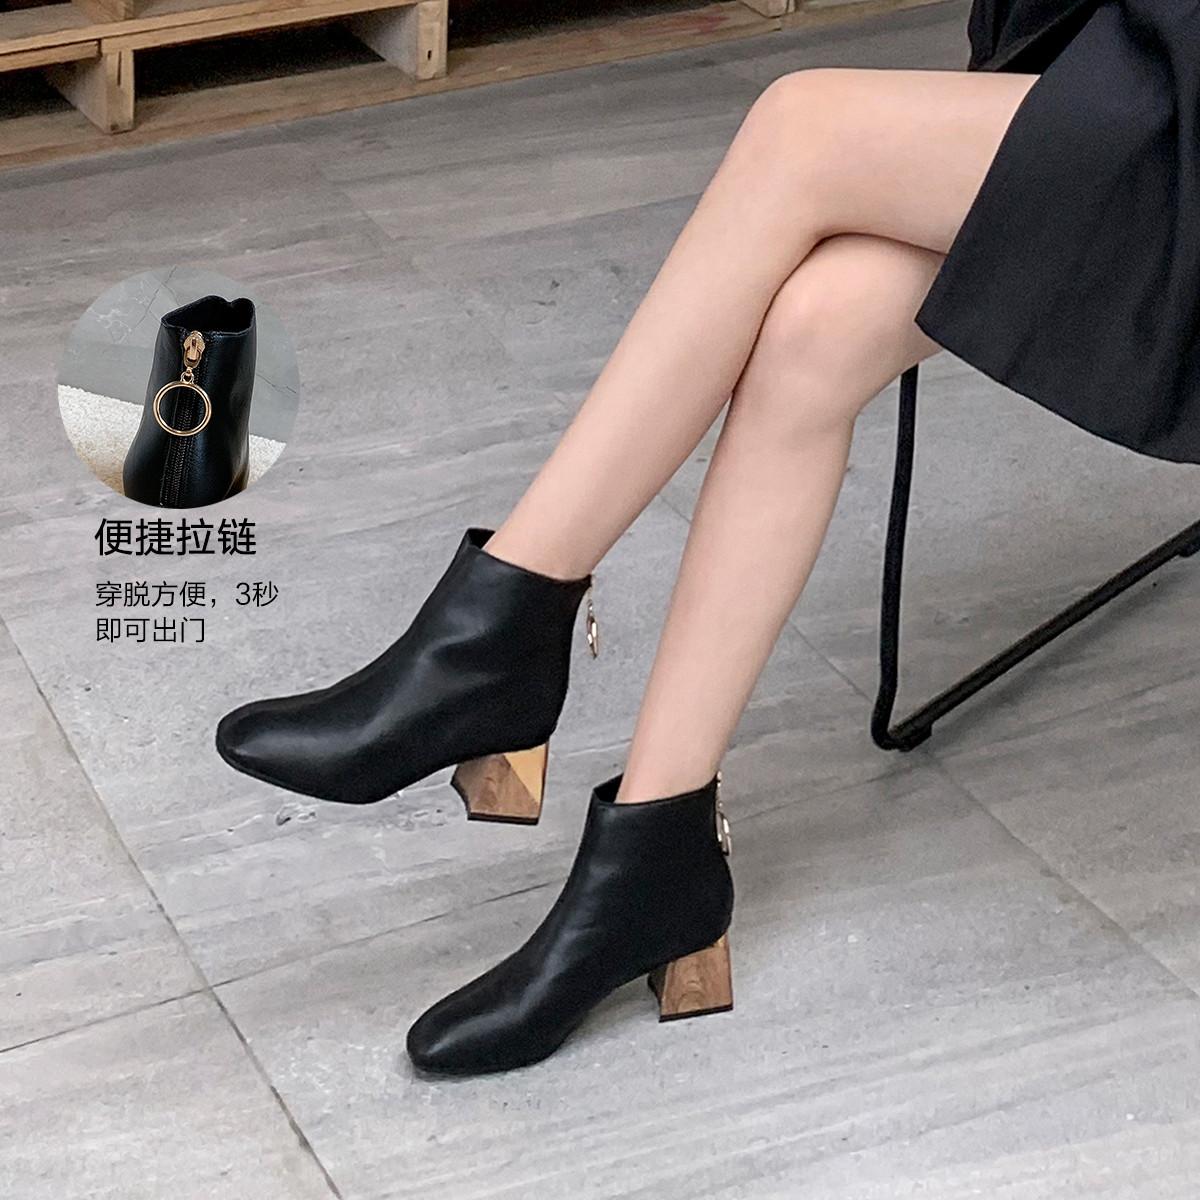 ZHR【欧美风】19新小皮靴机车单靴切尔西靴及踝靴秋冬靴子女靴短靴194AF60107-黑色